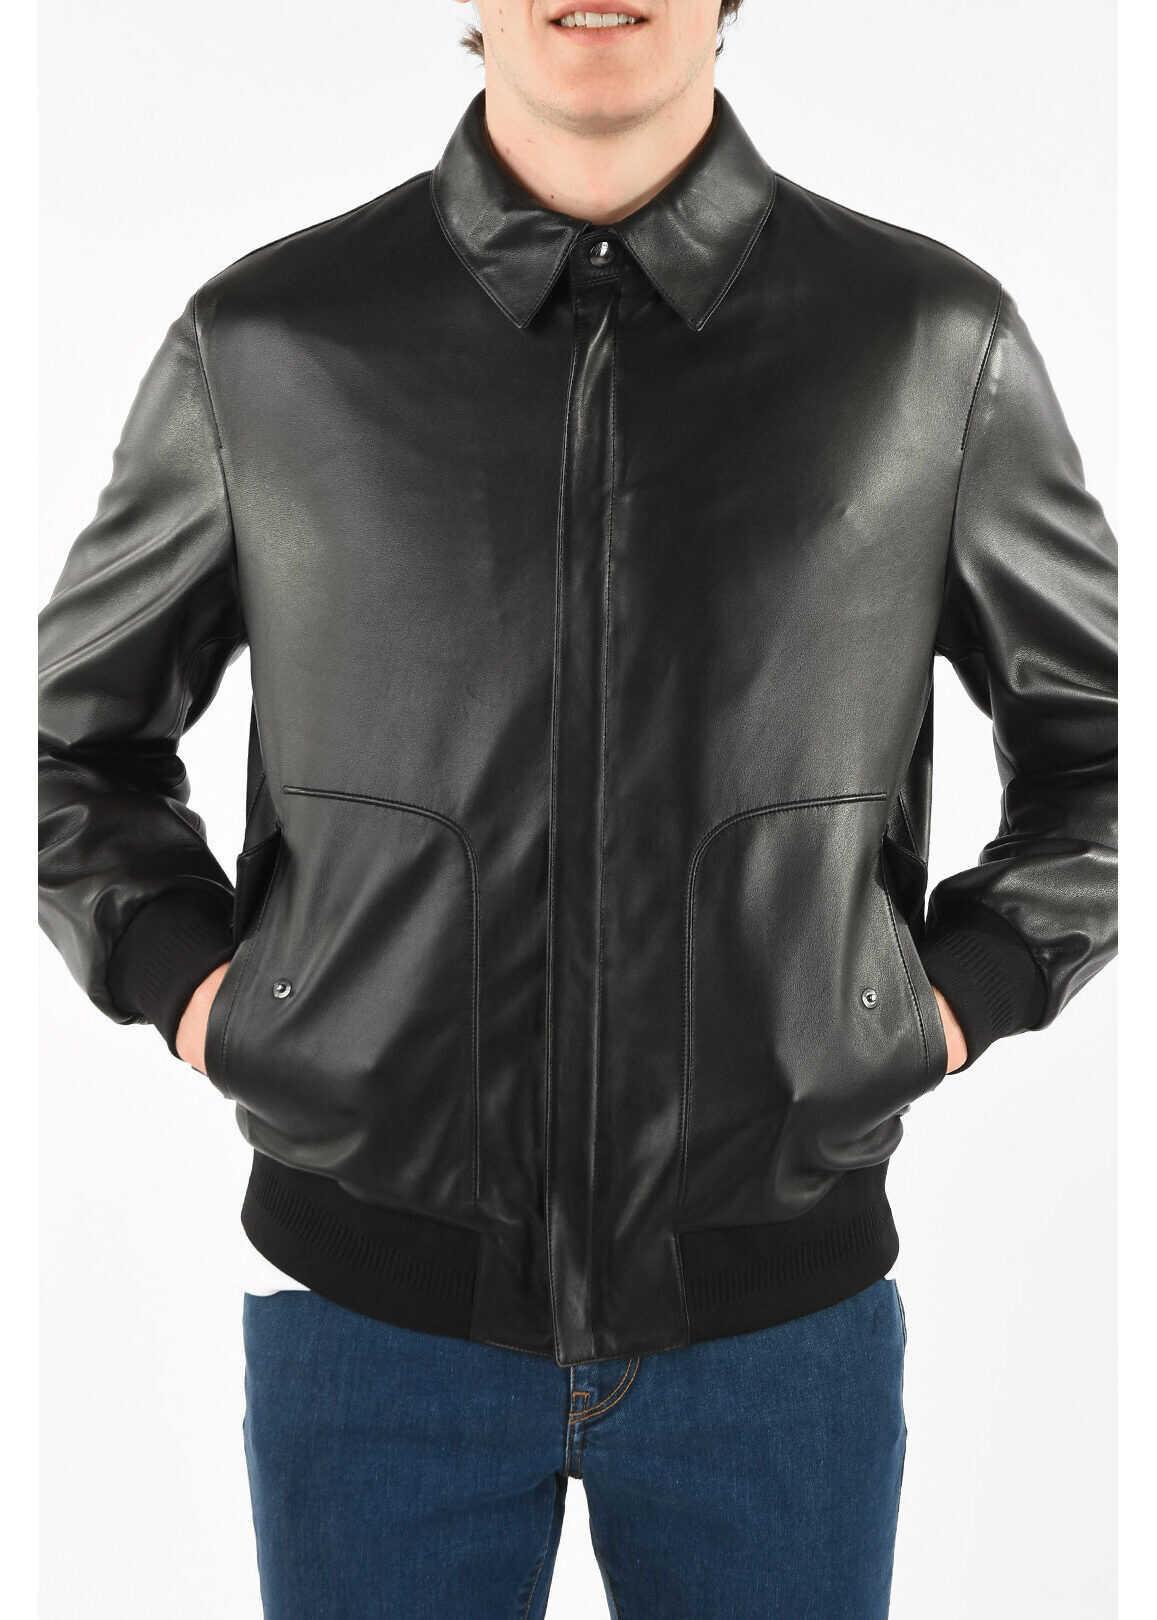 Ermenegildo Zegna Z ZEGNA Soft Leather Flap Pocket Jacket with Zip Closure BLACK imagine